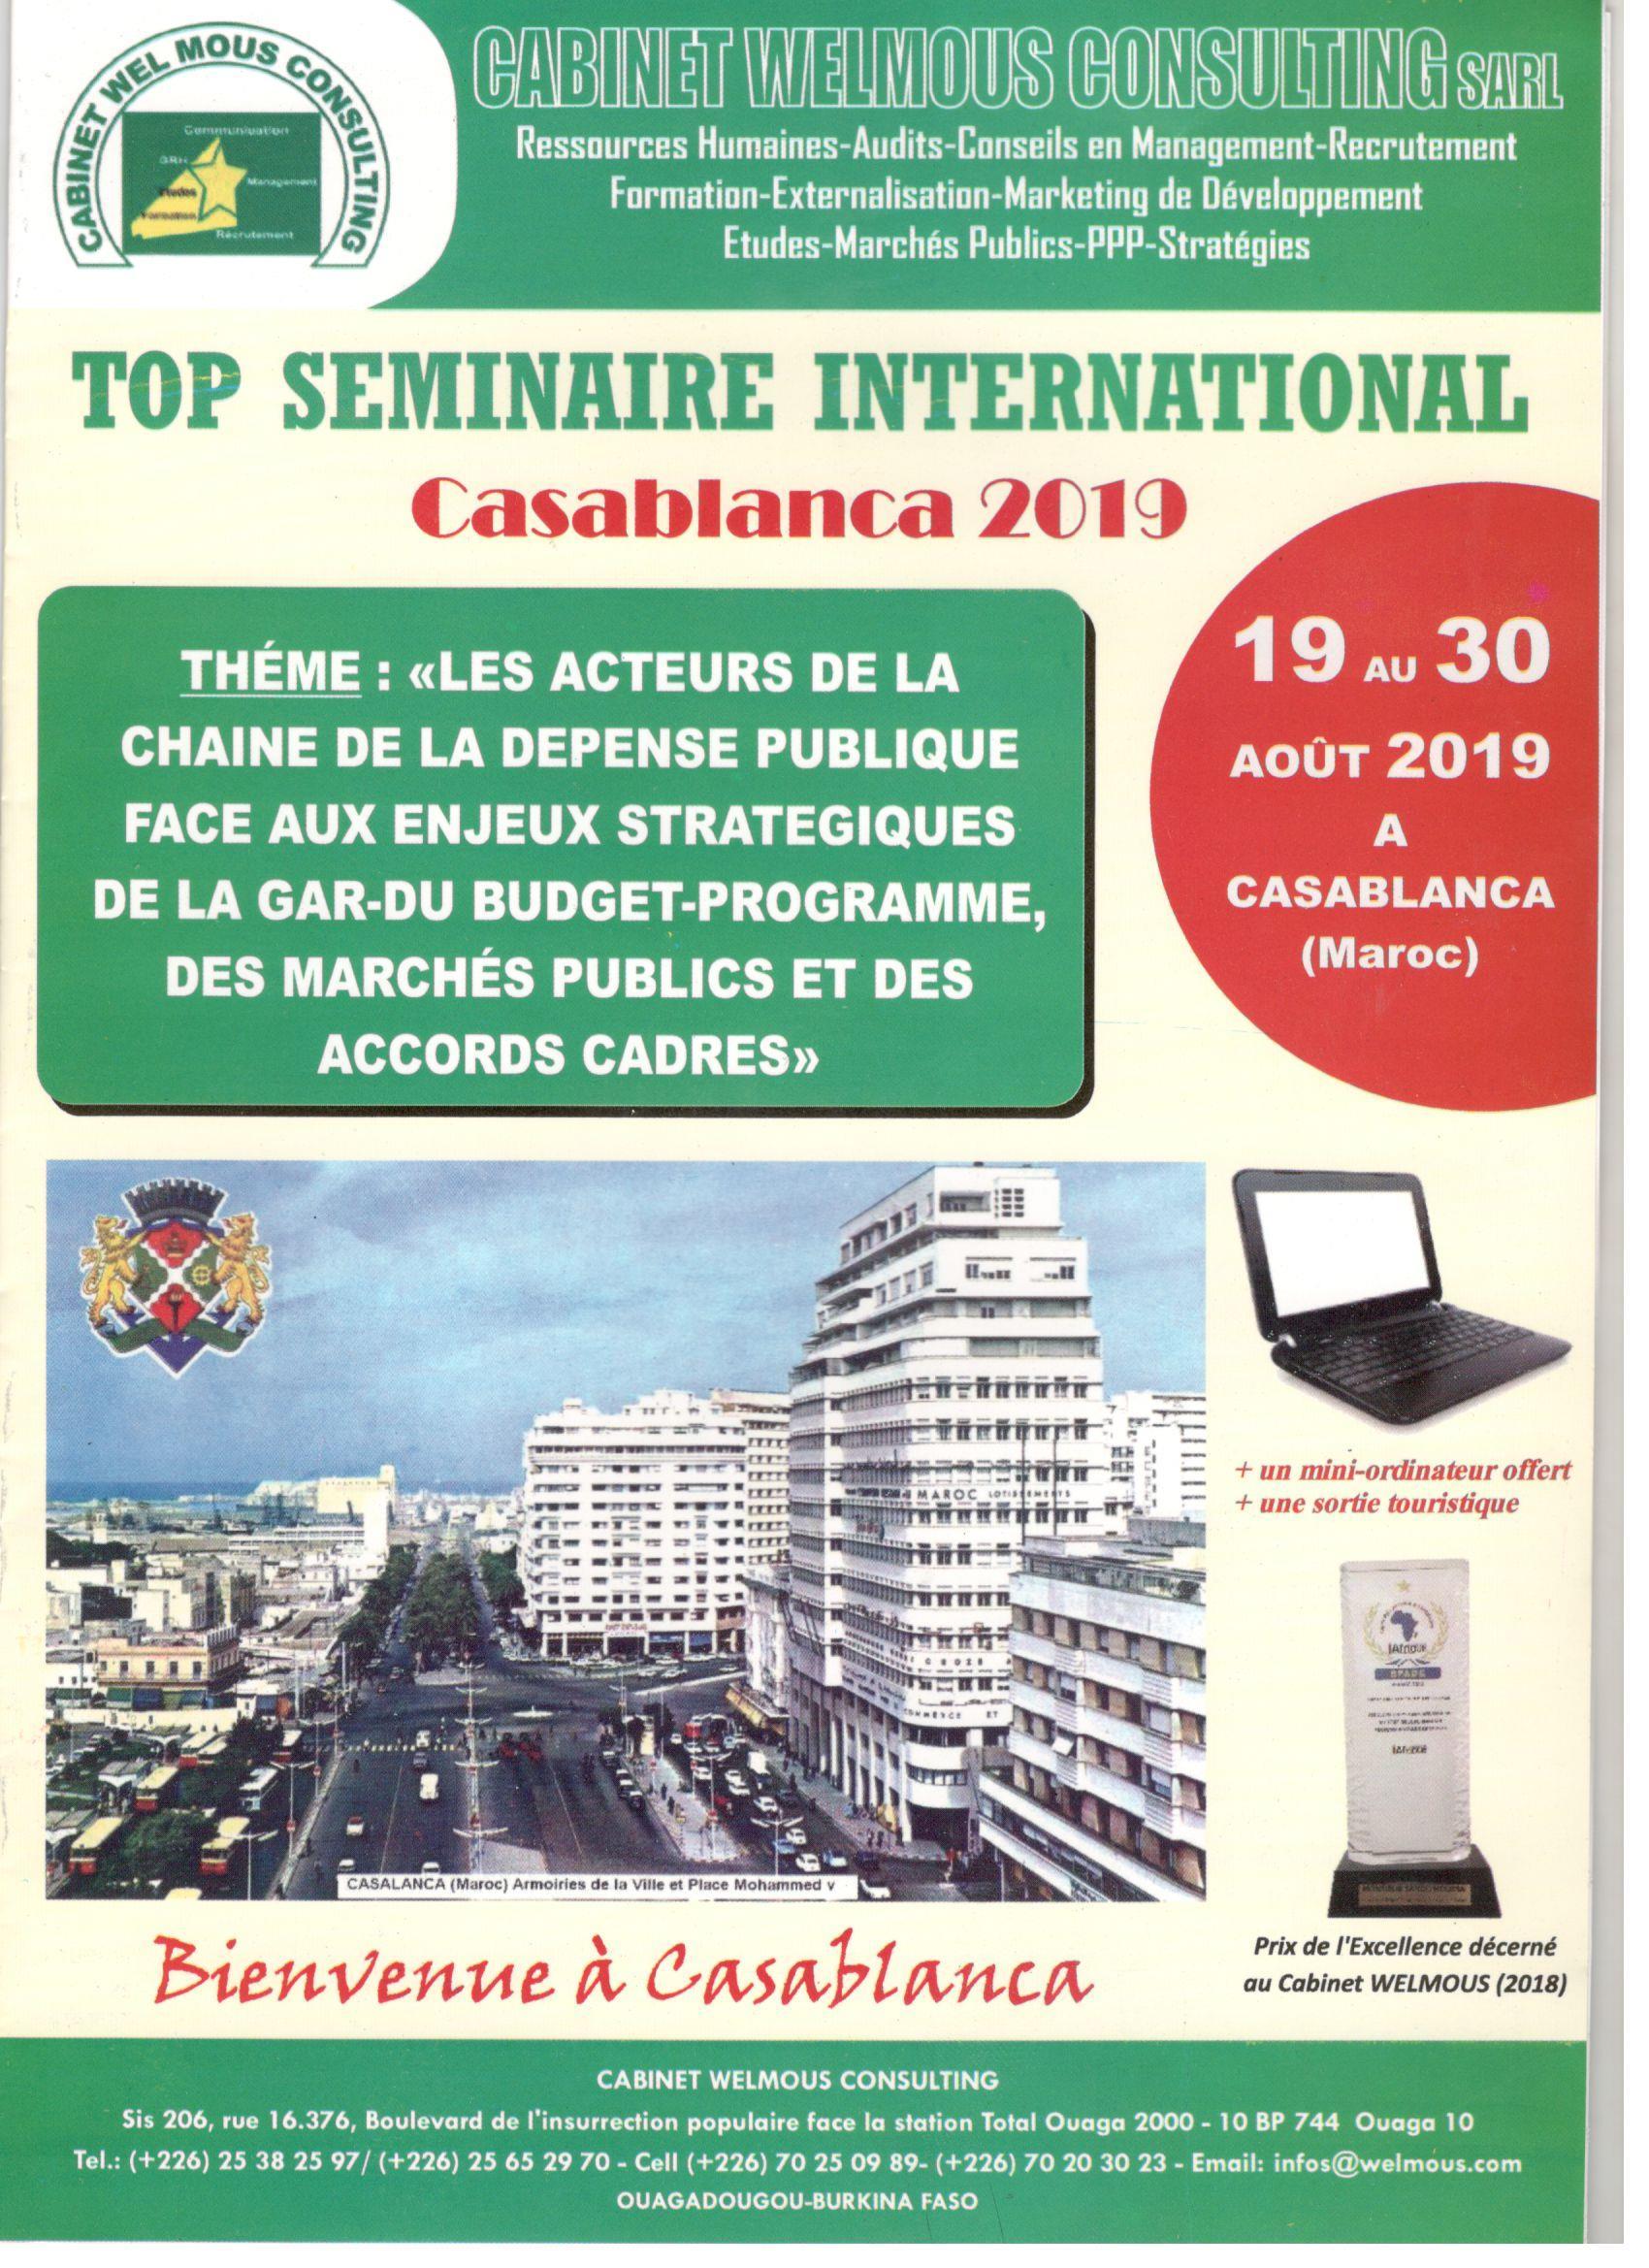 TOP Séminaire International 2019, du 19 au 30 Août 2019 à Casablanca (Maroc).